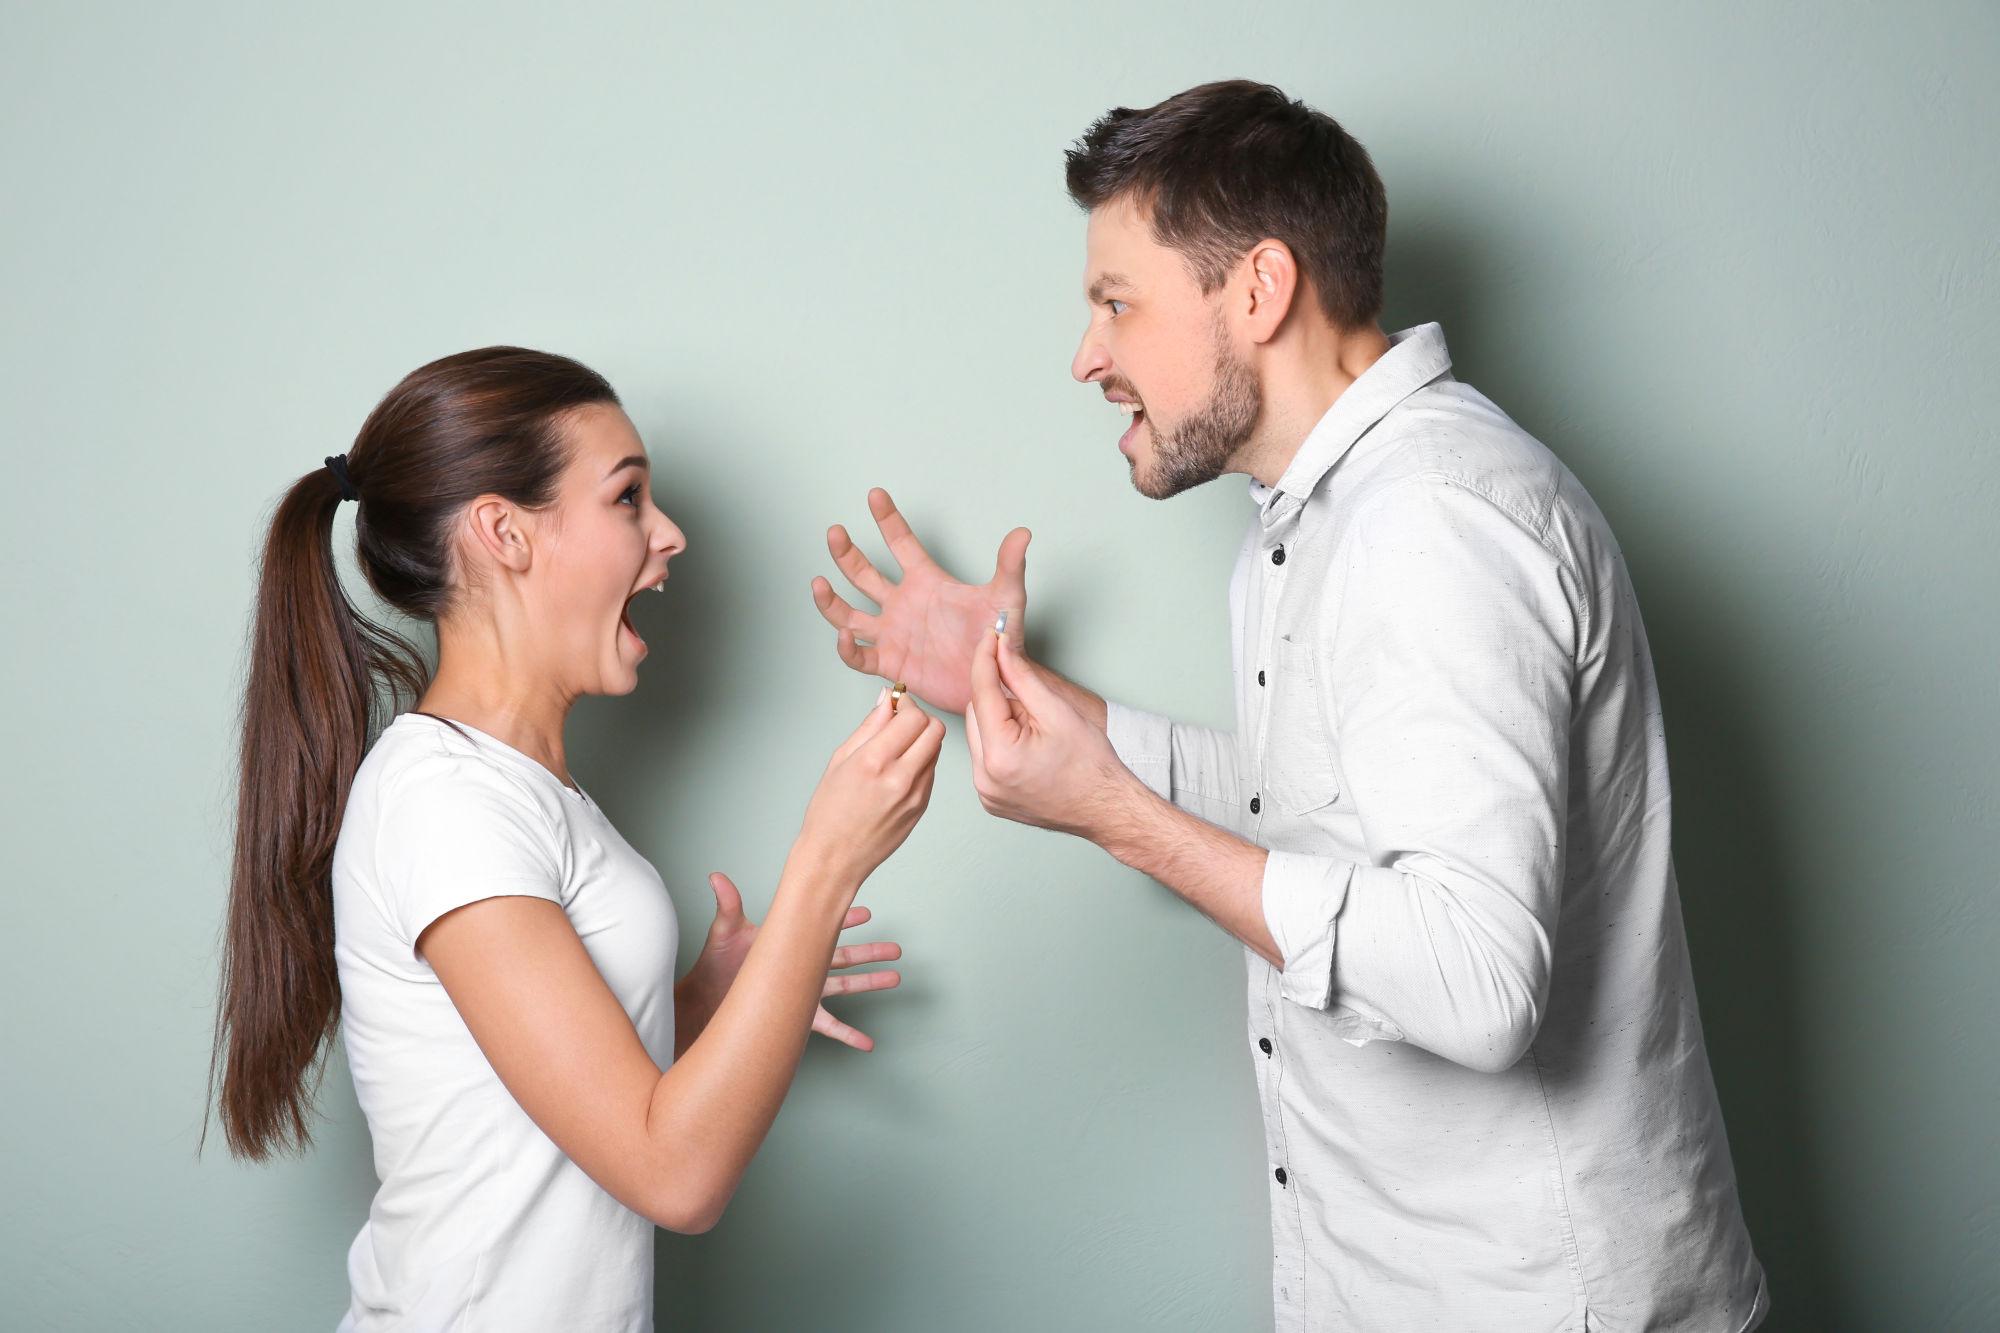 Tense couple